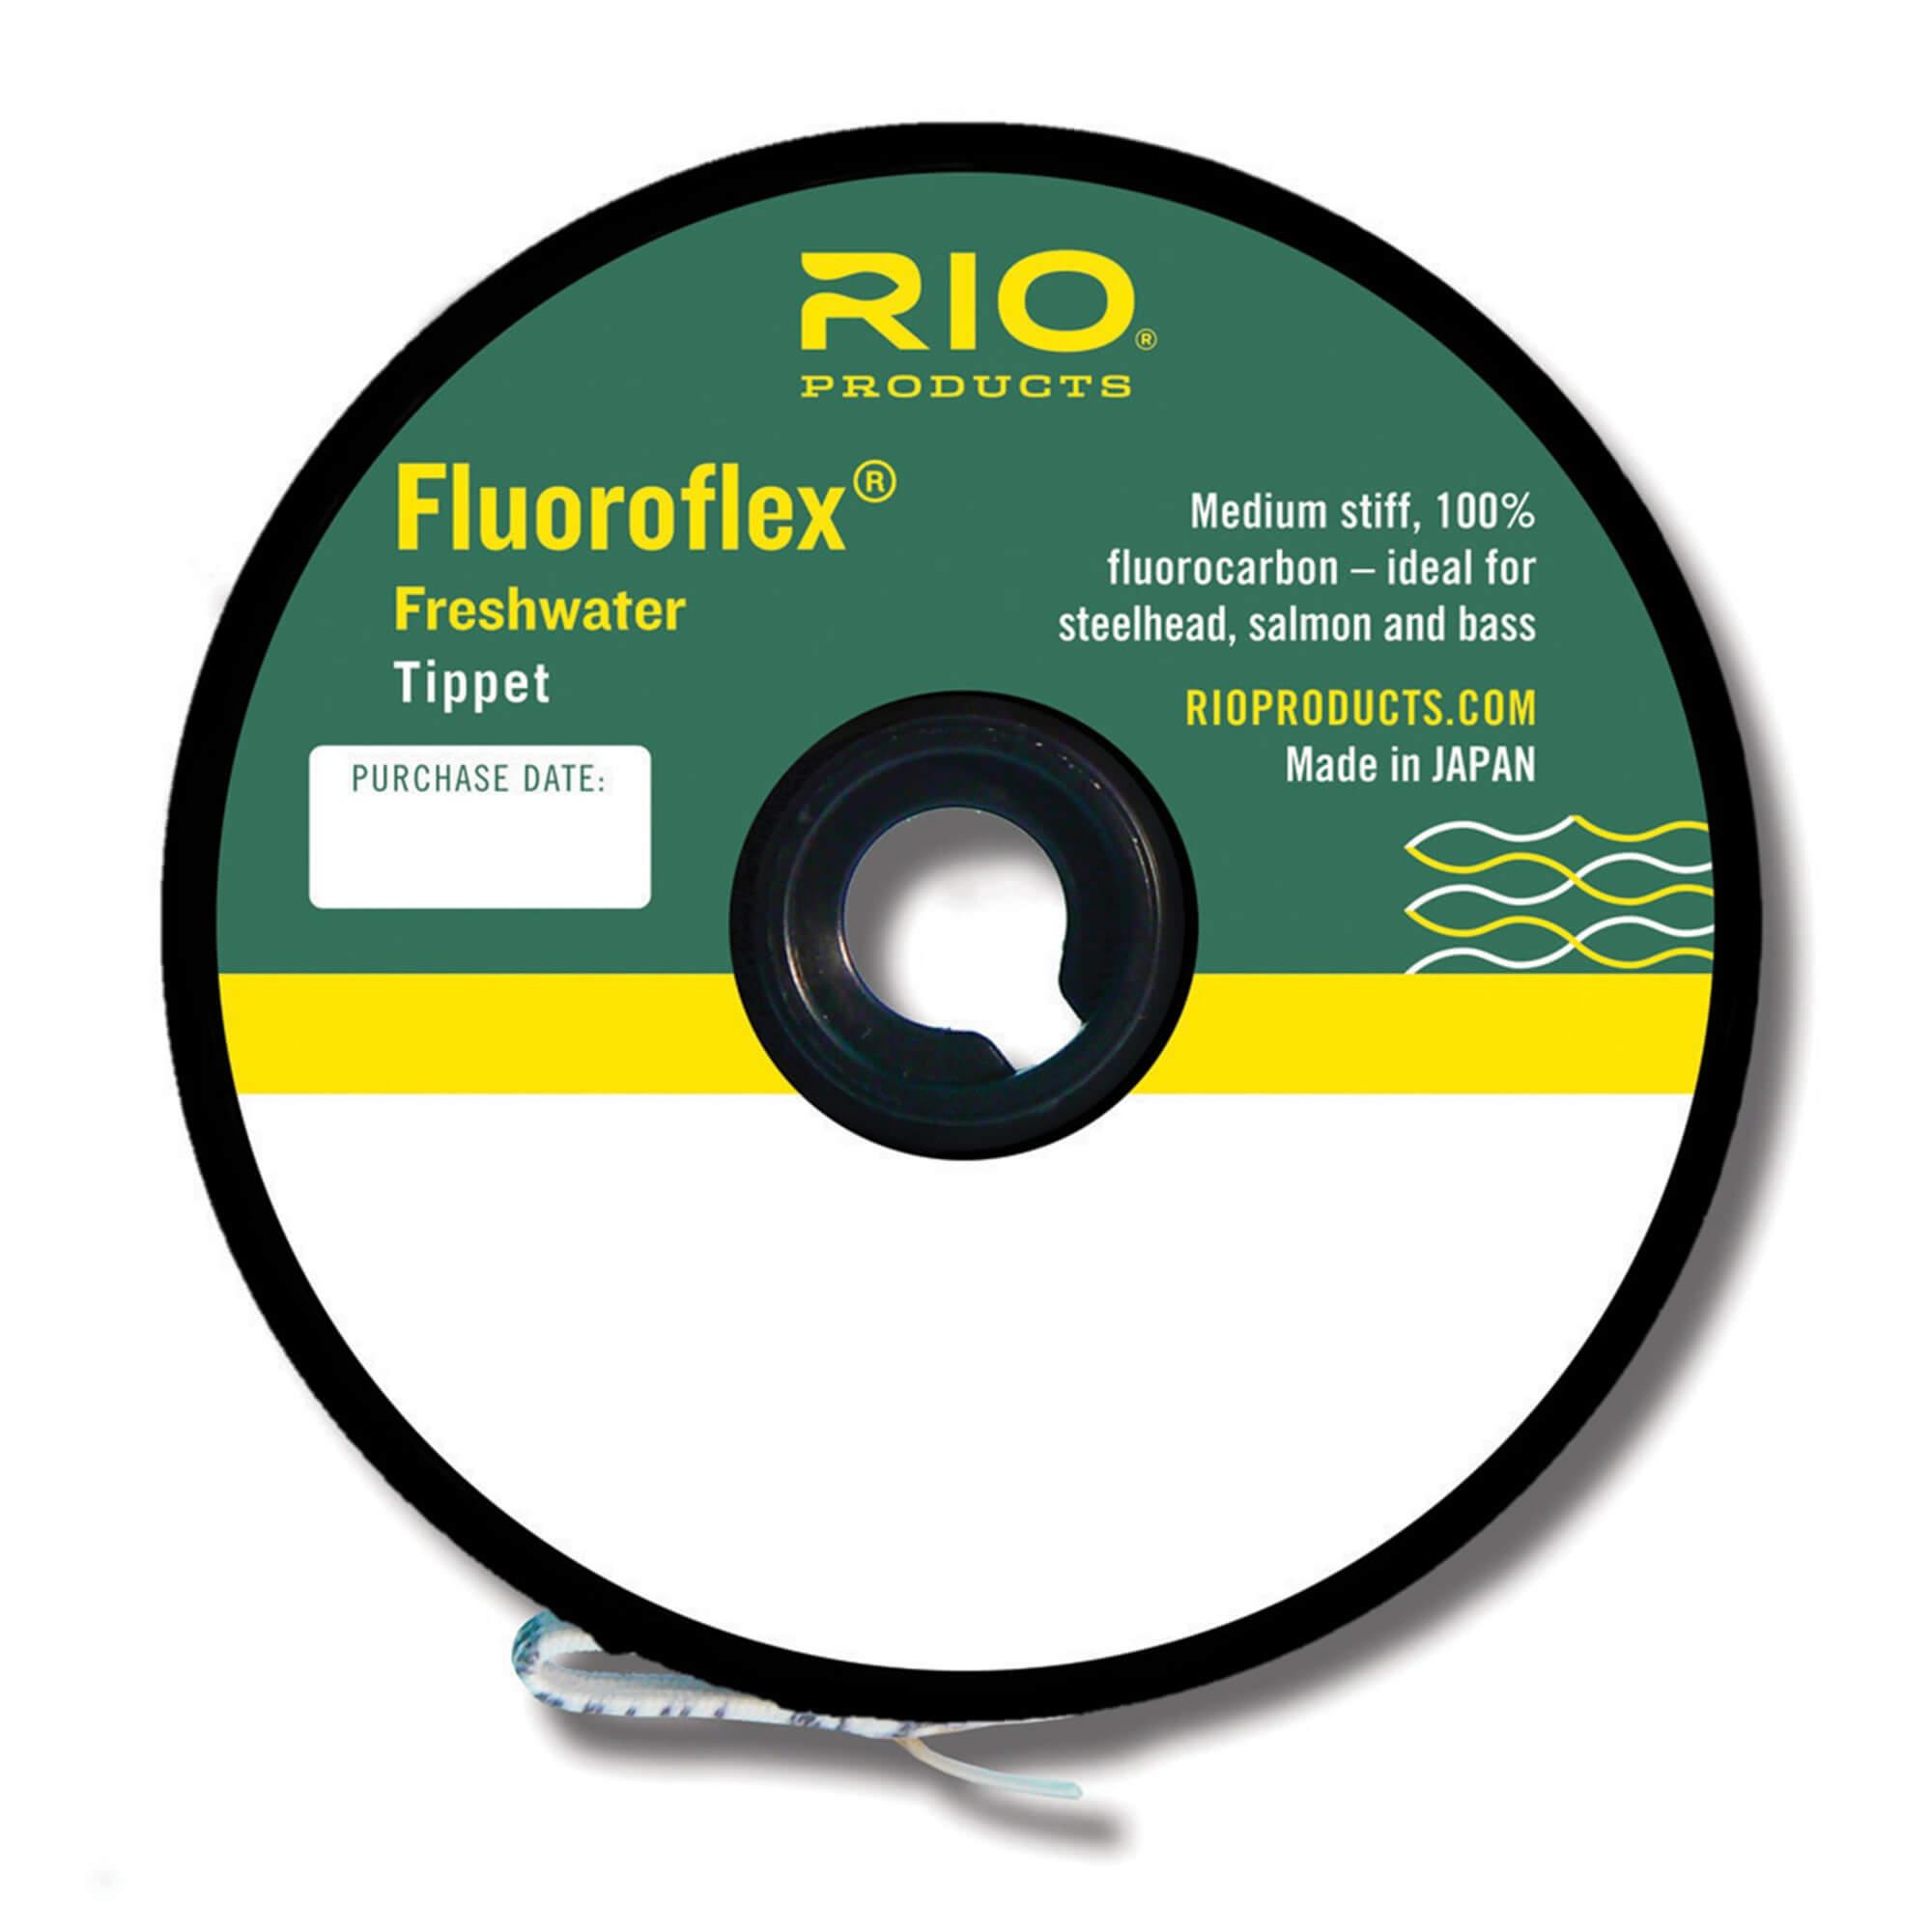 Freshwater Tippet Fluoroflex